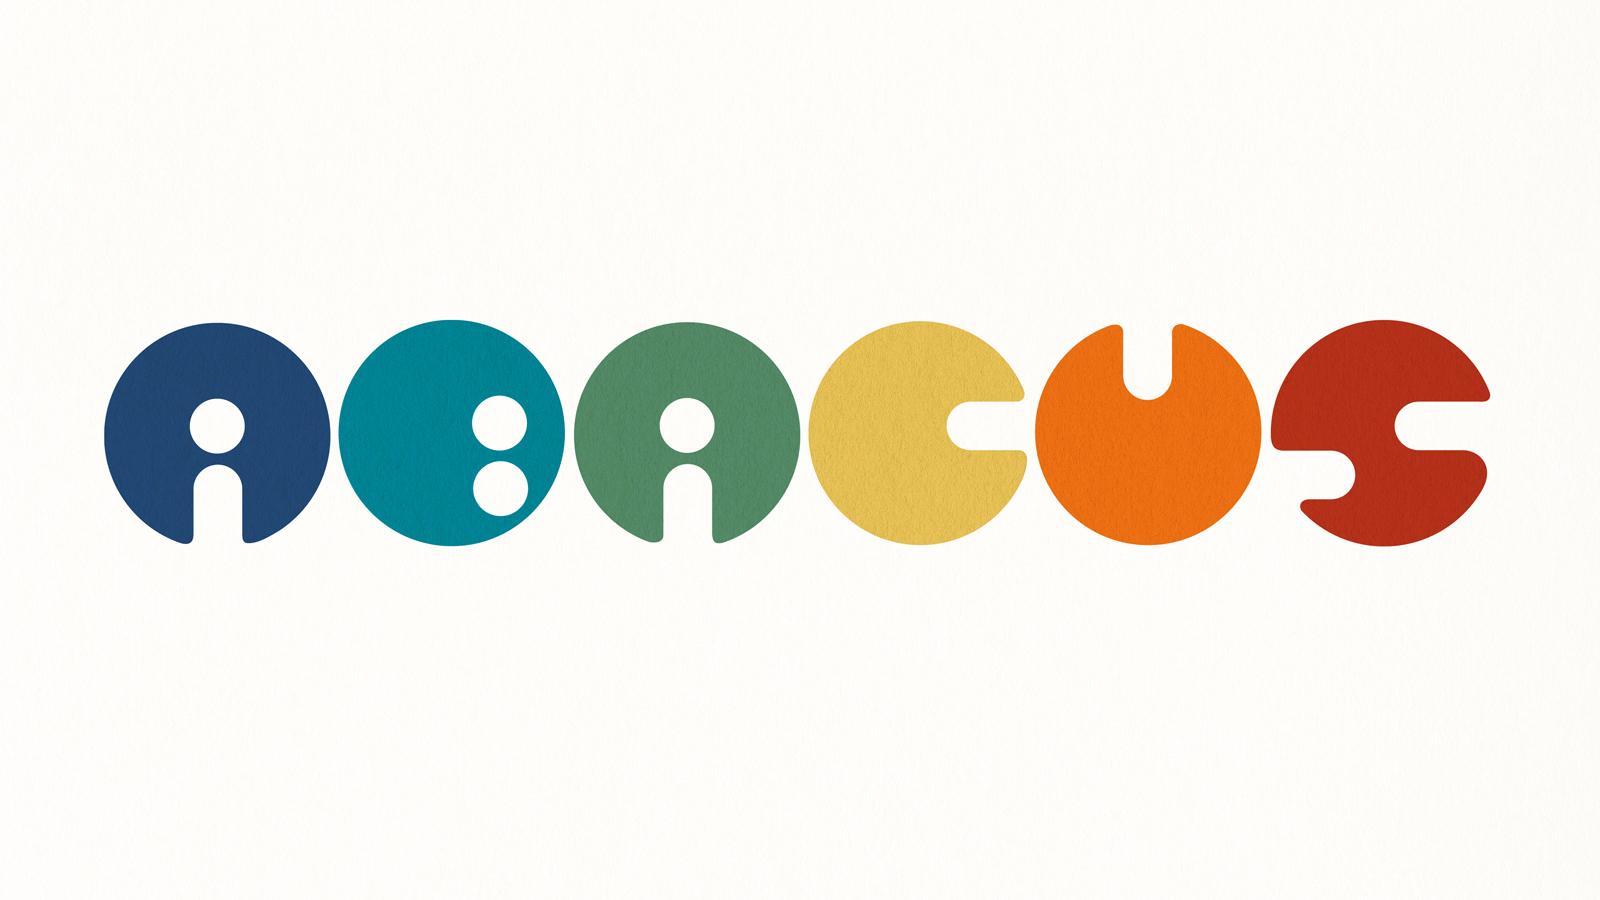 ab_comp00-1[logo].jpg